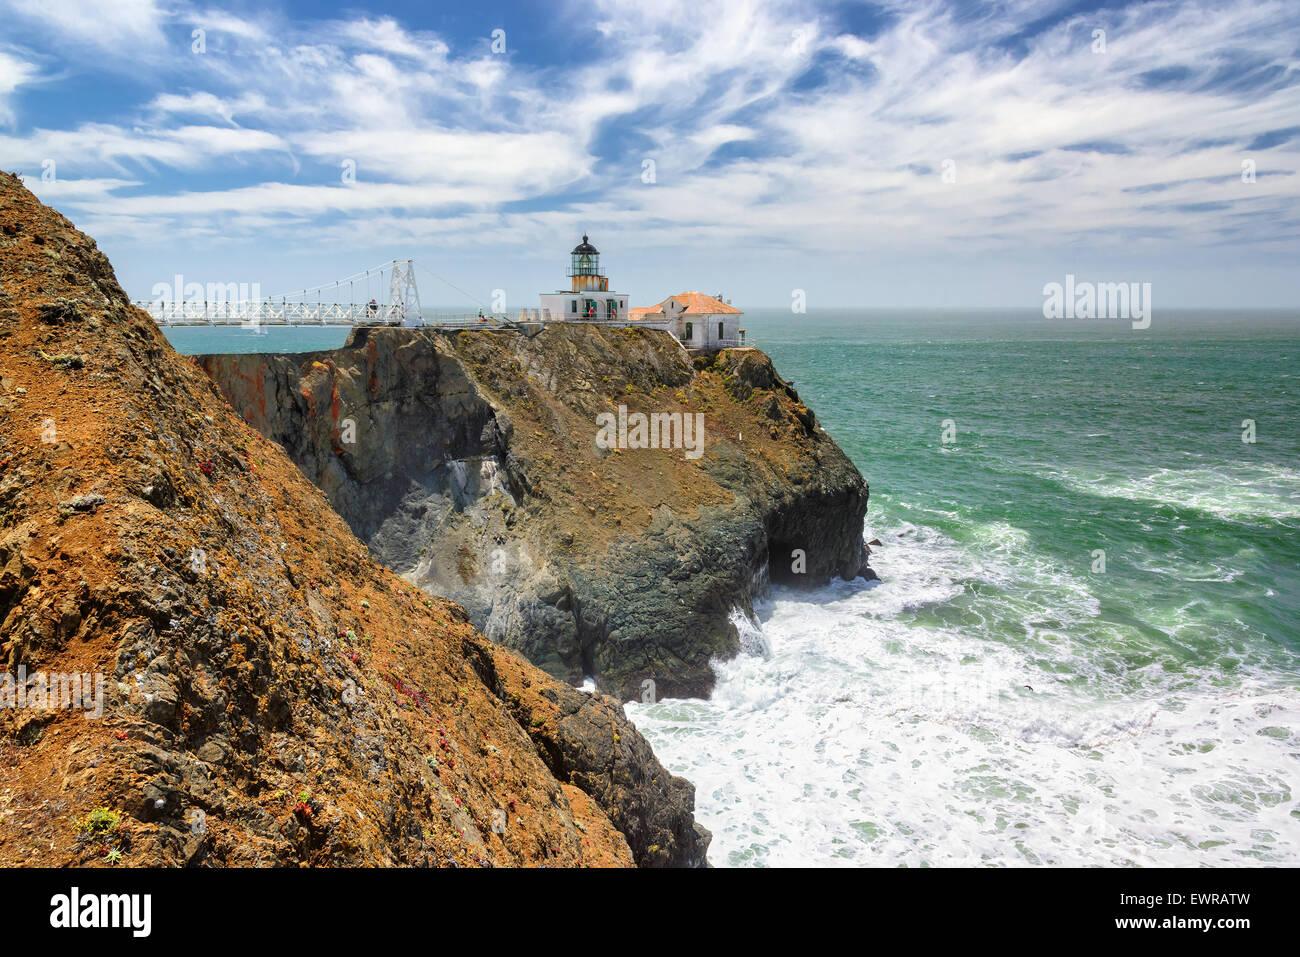 Faro en la roca. Faro de Punta Bonita, en San Francisco, California Imagen De Stock